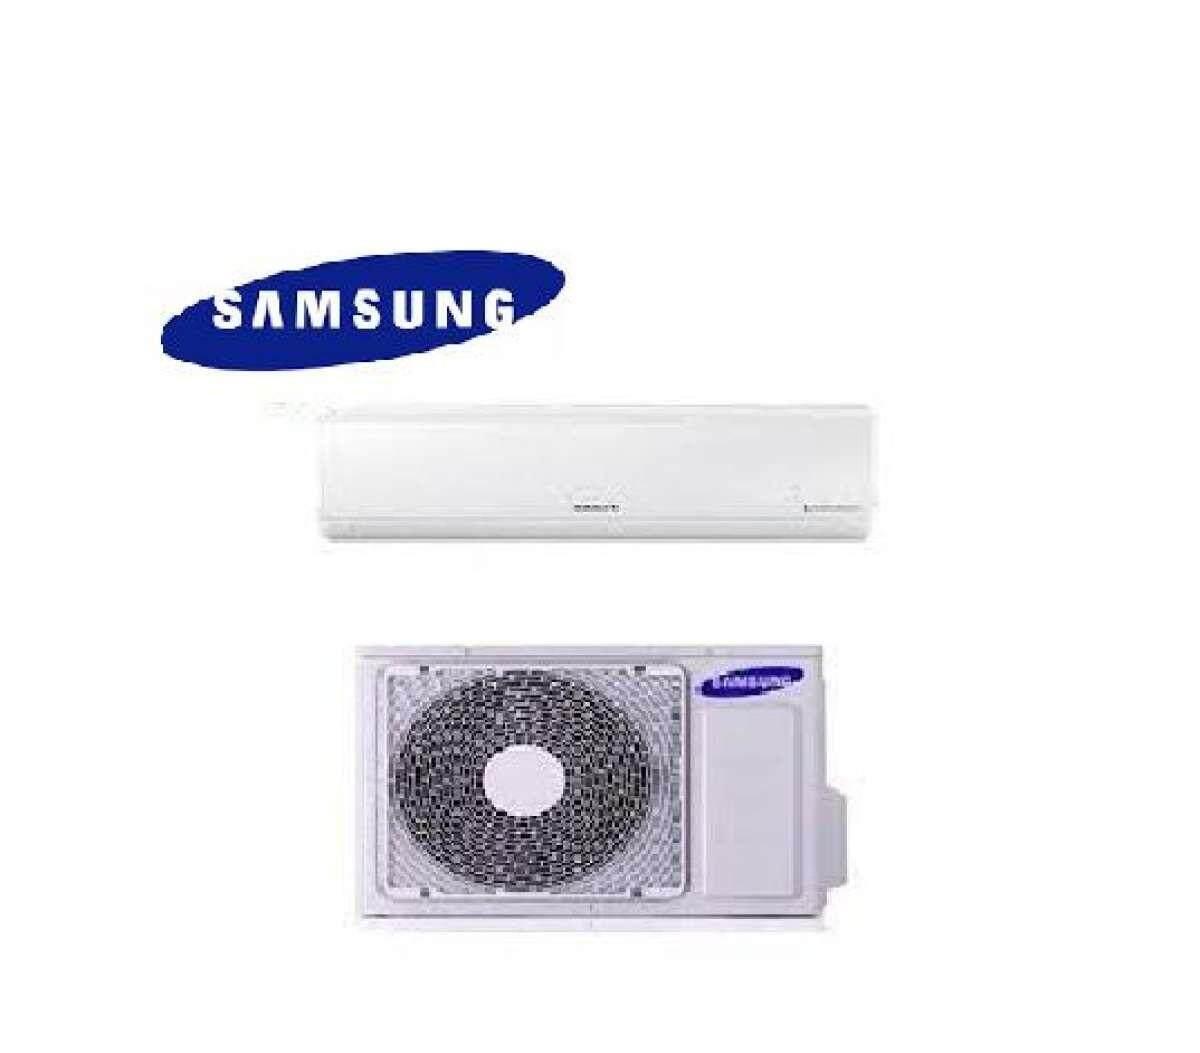 Samsung 1.5hp Inverter Deluxe Air Conditioner : AR12MVFHJWKNME